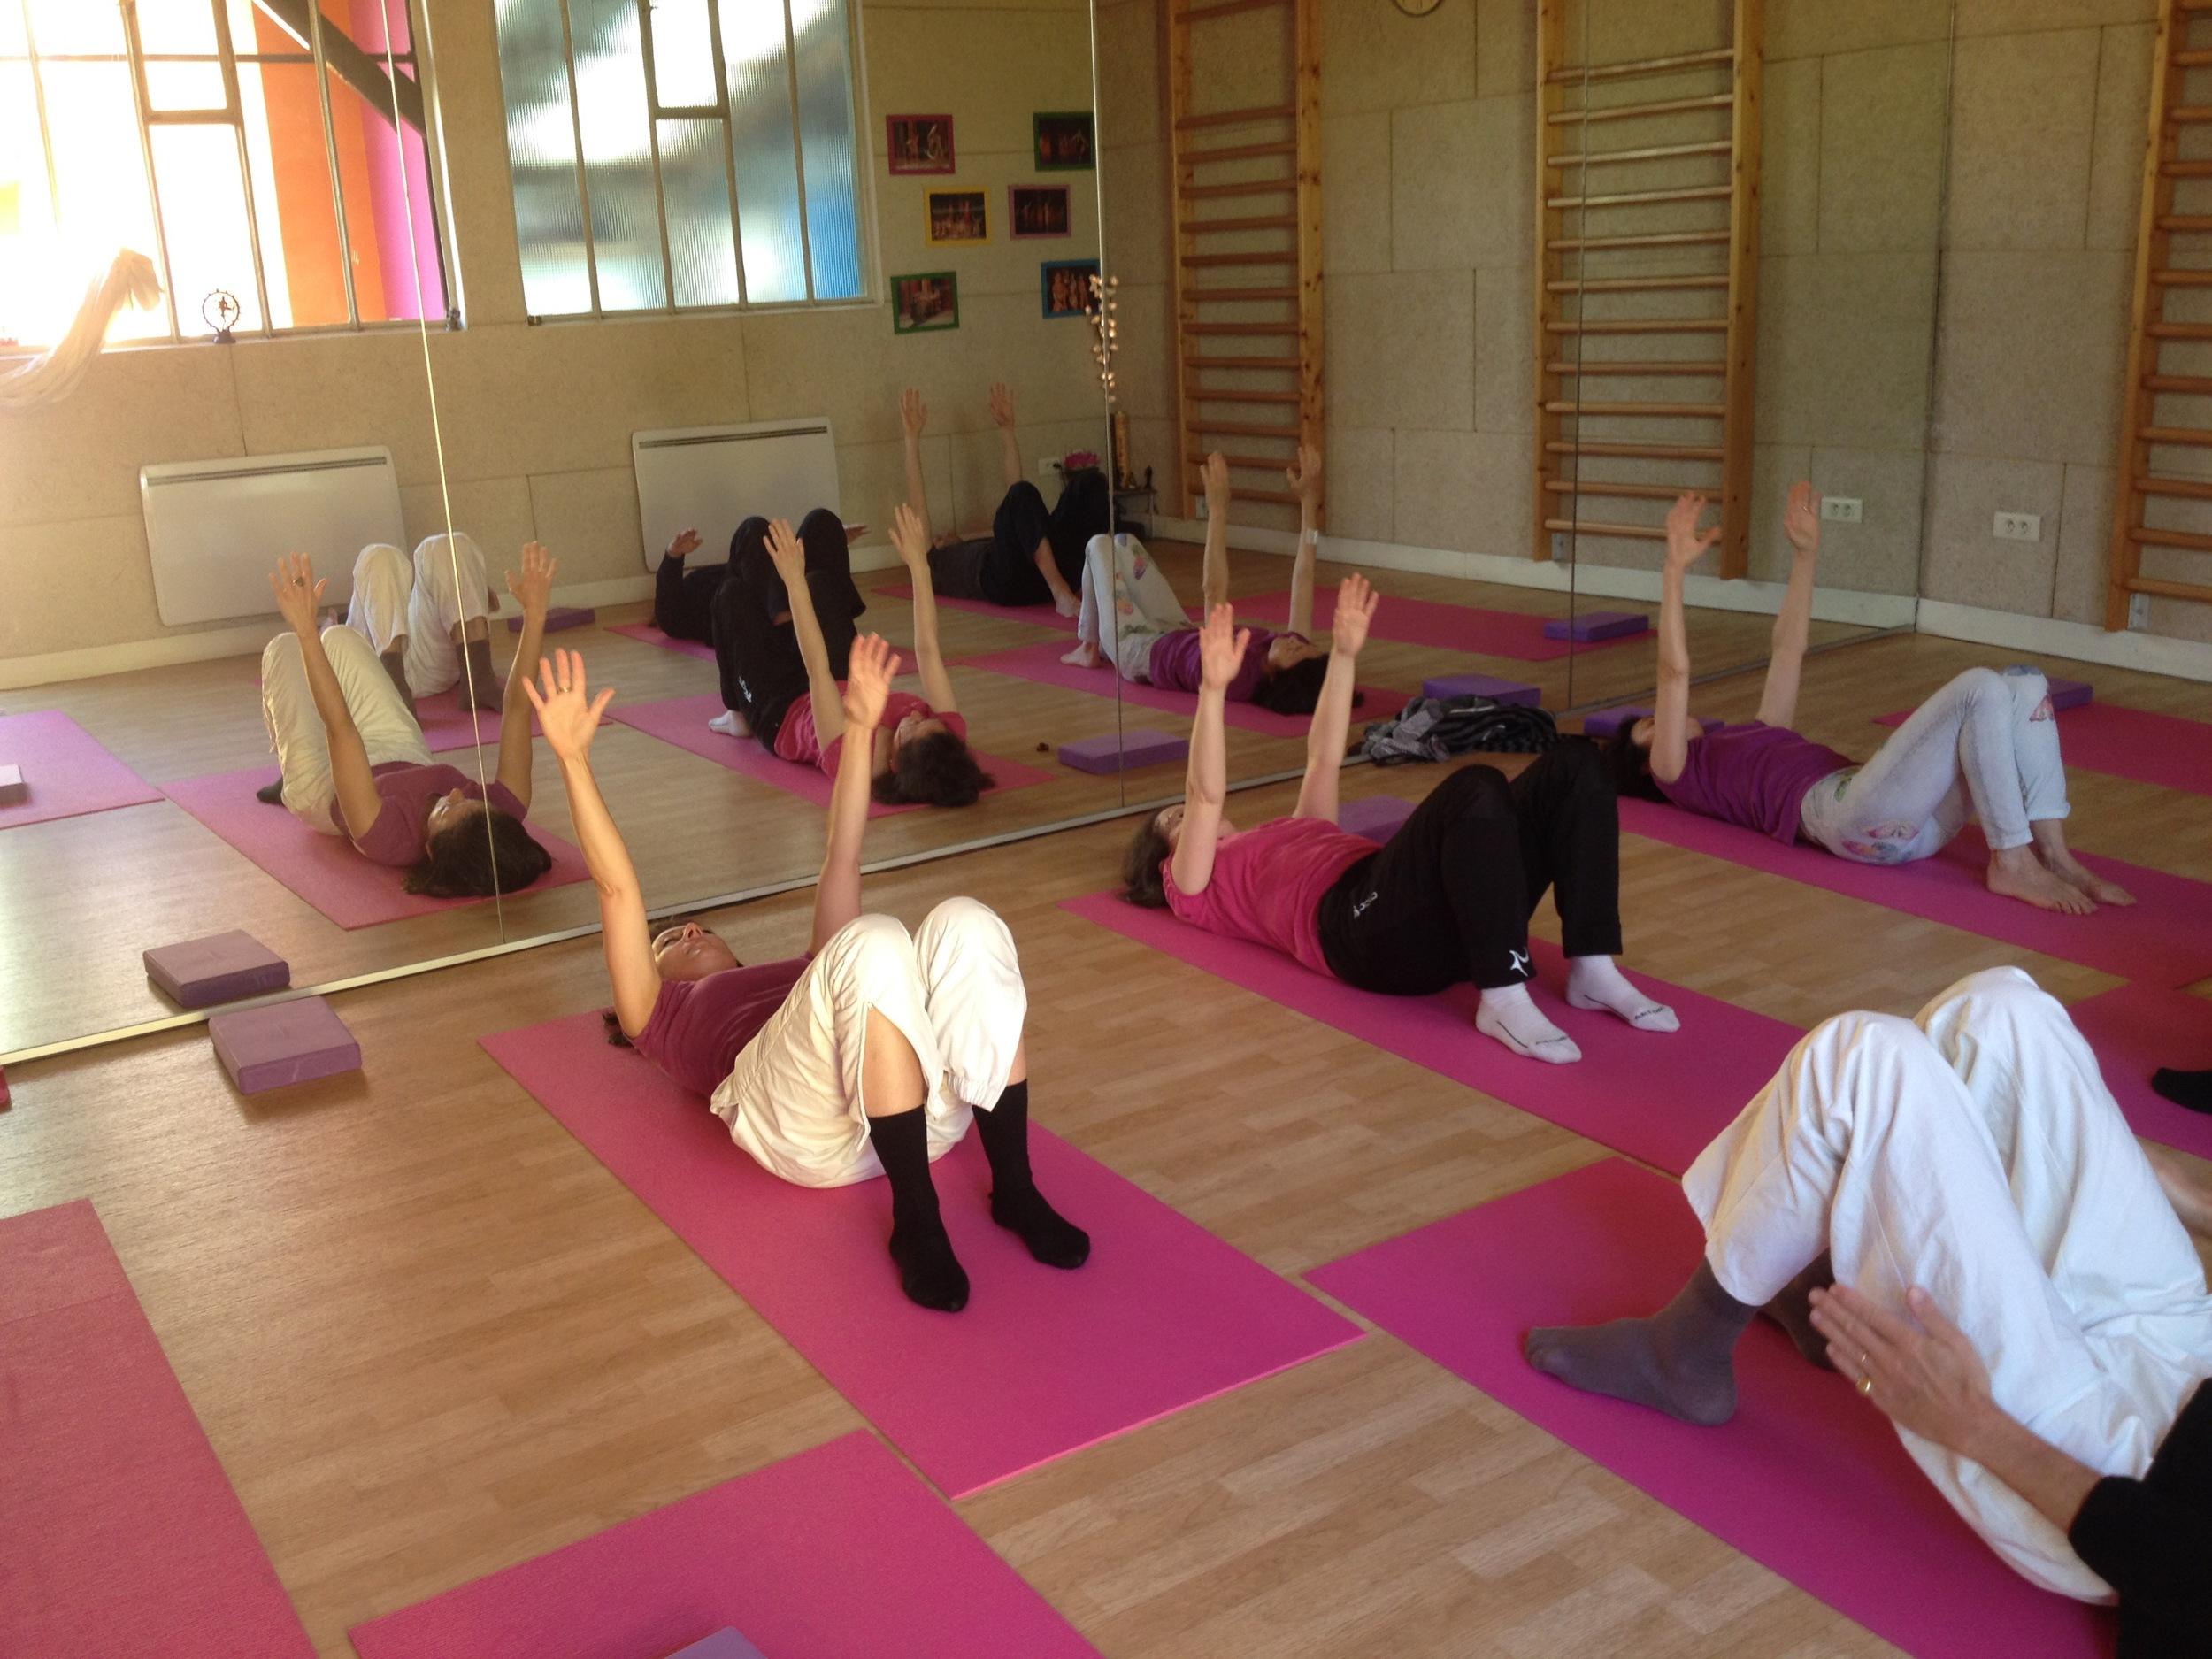 cours-yoga-padma-studio.jpg